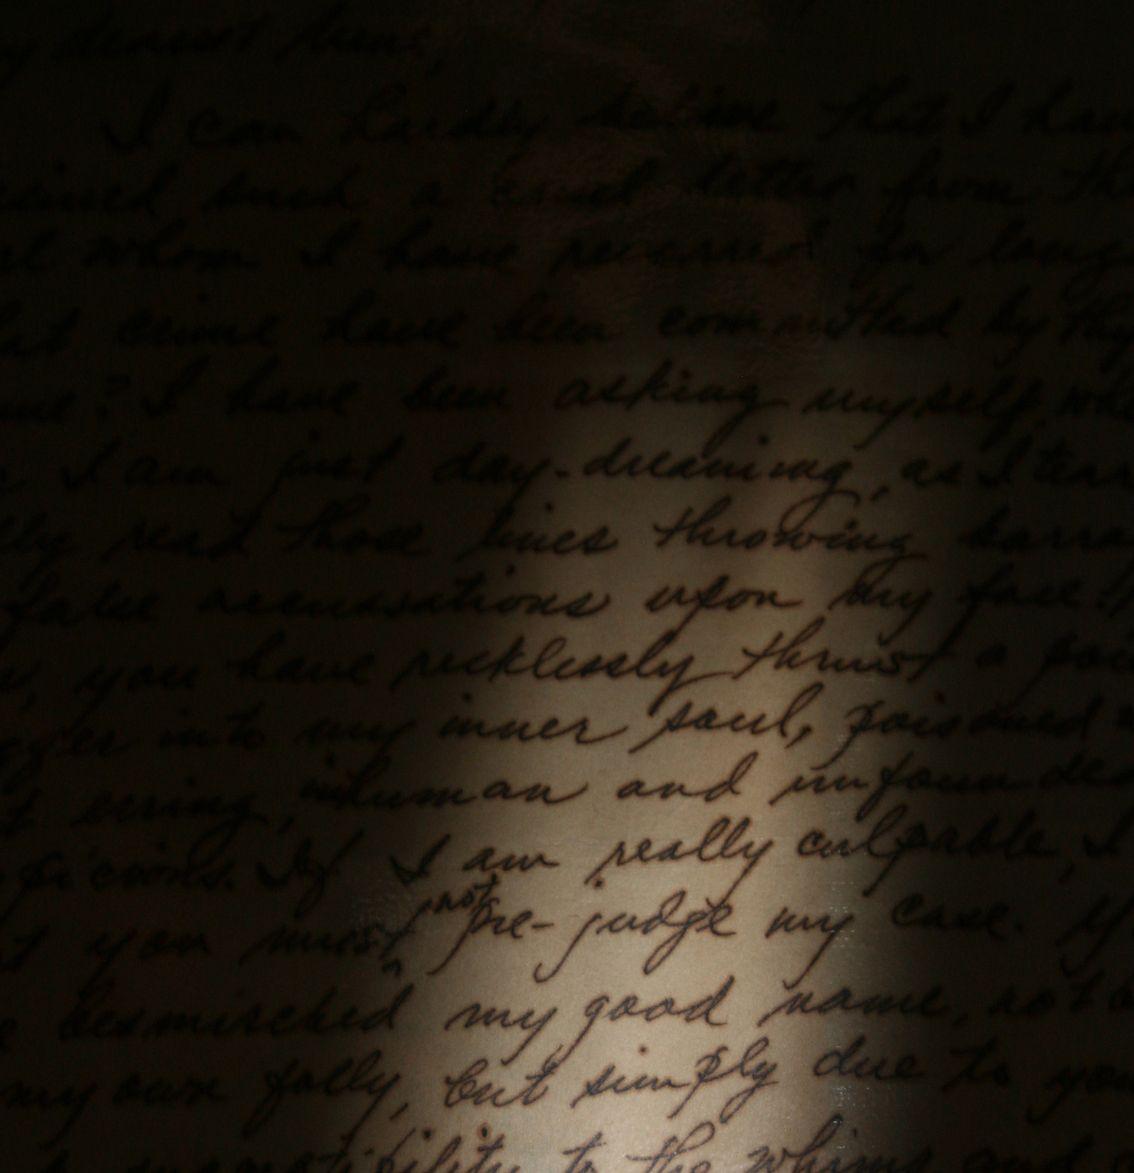 One of the love letters my Grandpa wrote my Grandma <3